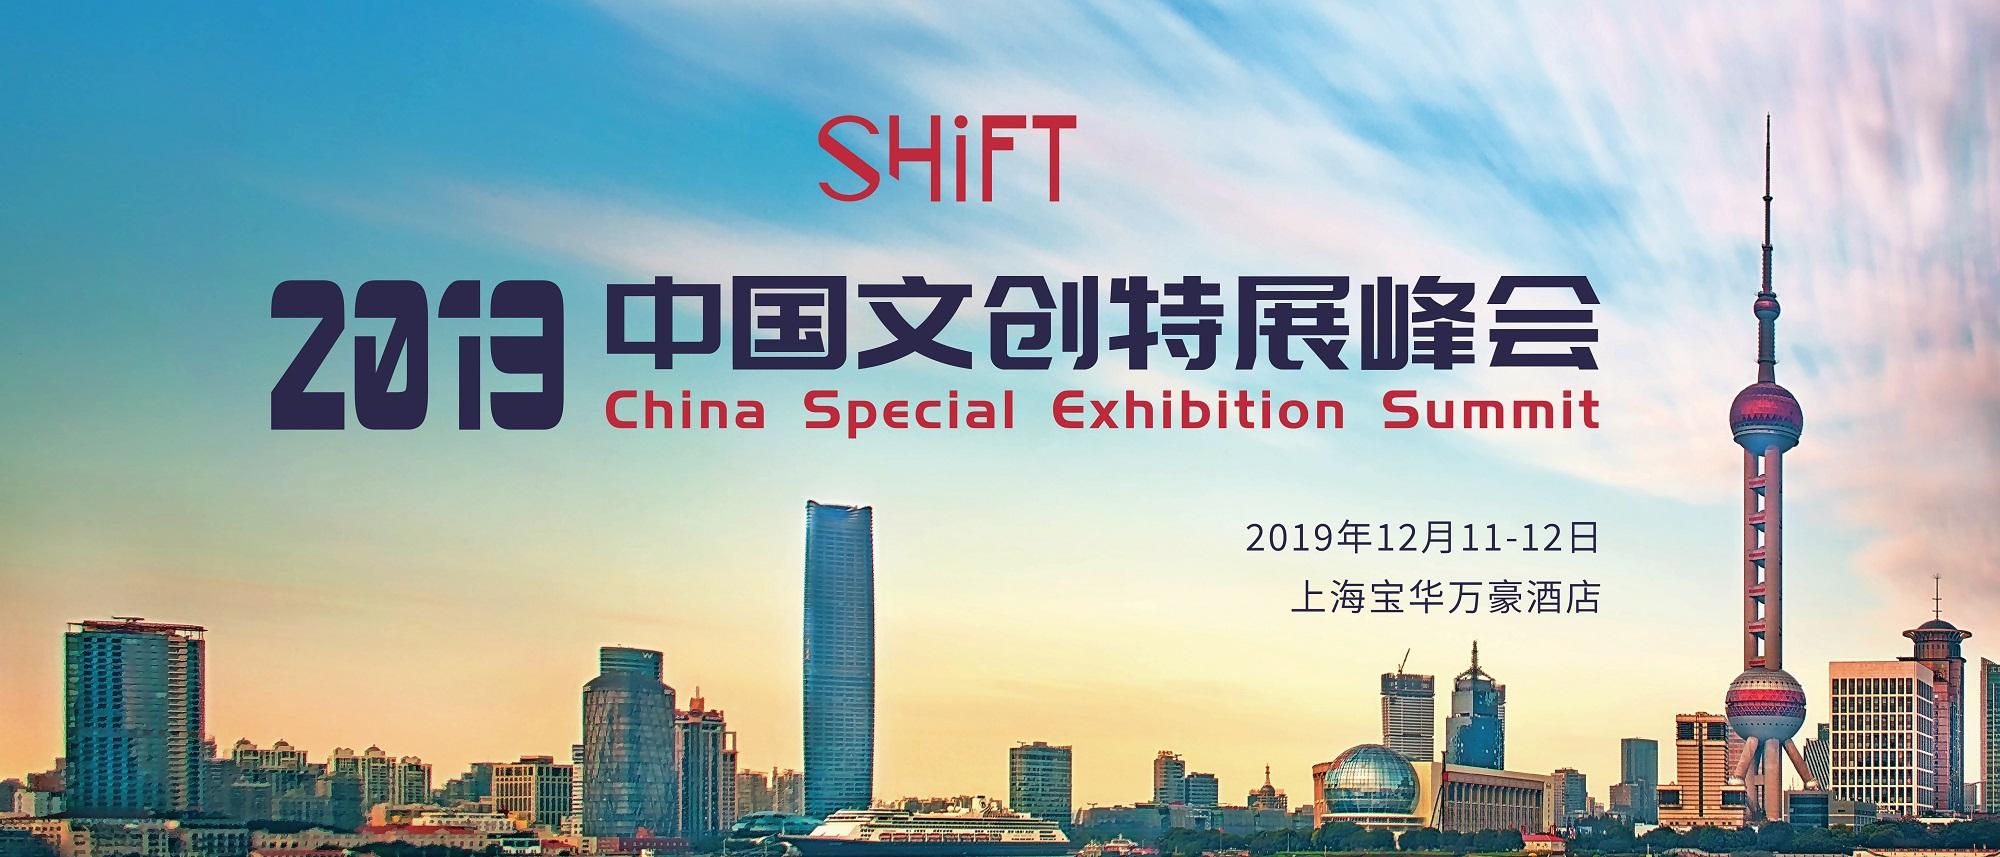 SHiFT2019中国文创特展峰会